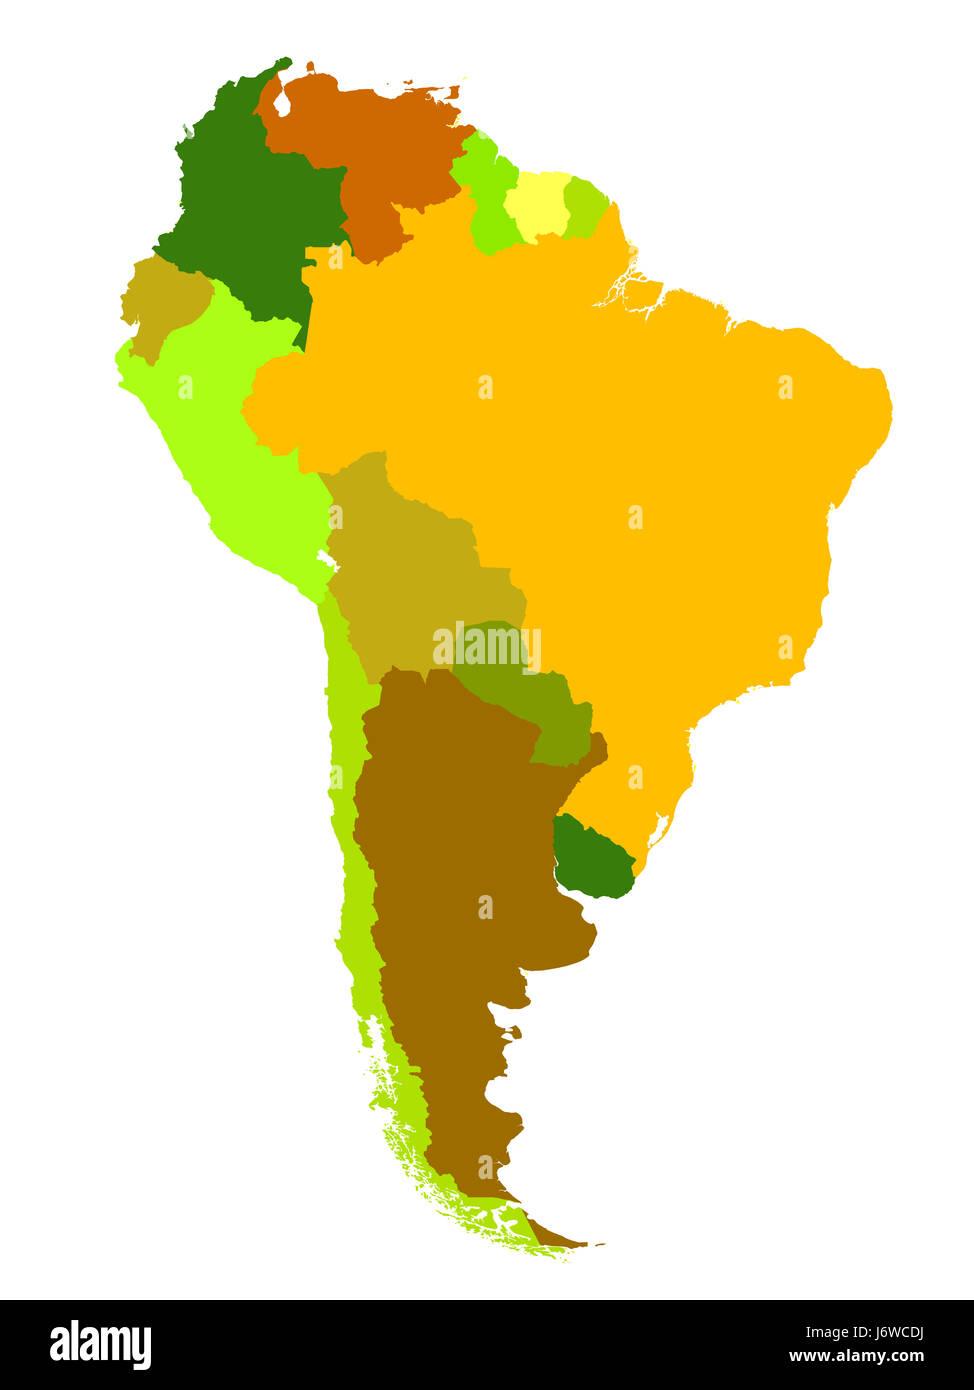 american america argentina brazil bolivia administrative map atlas